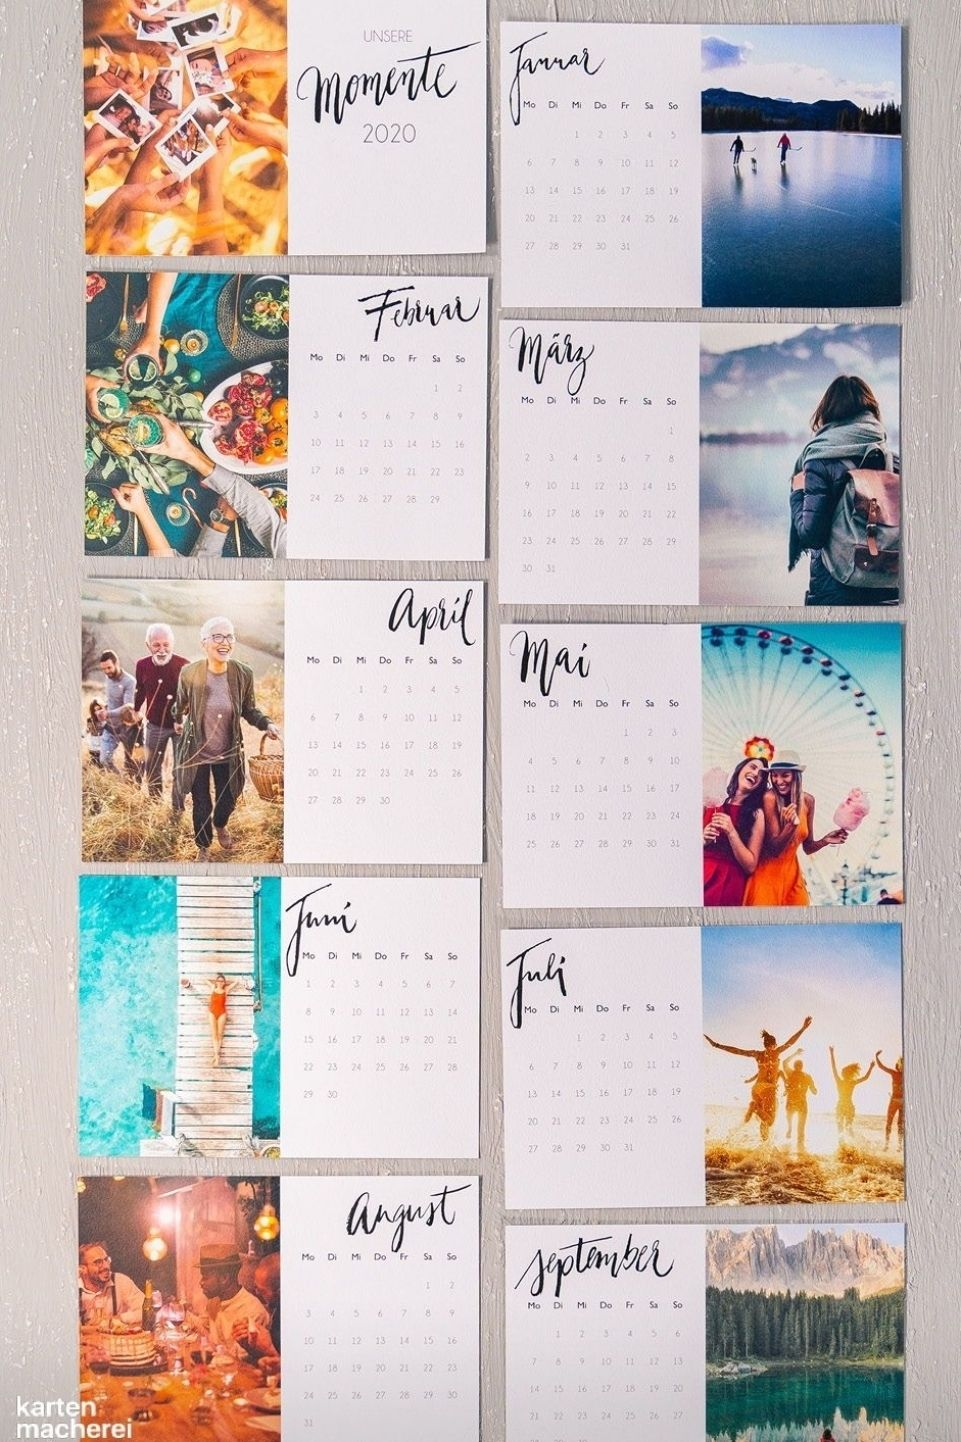 Mit 2021 Calendar Printable Calendar 2021 January 2021 December 2021 | Etsy in 2021